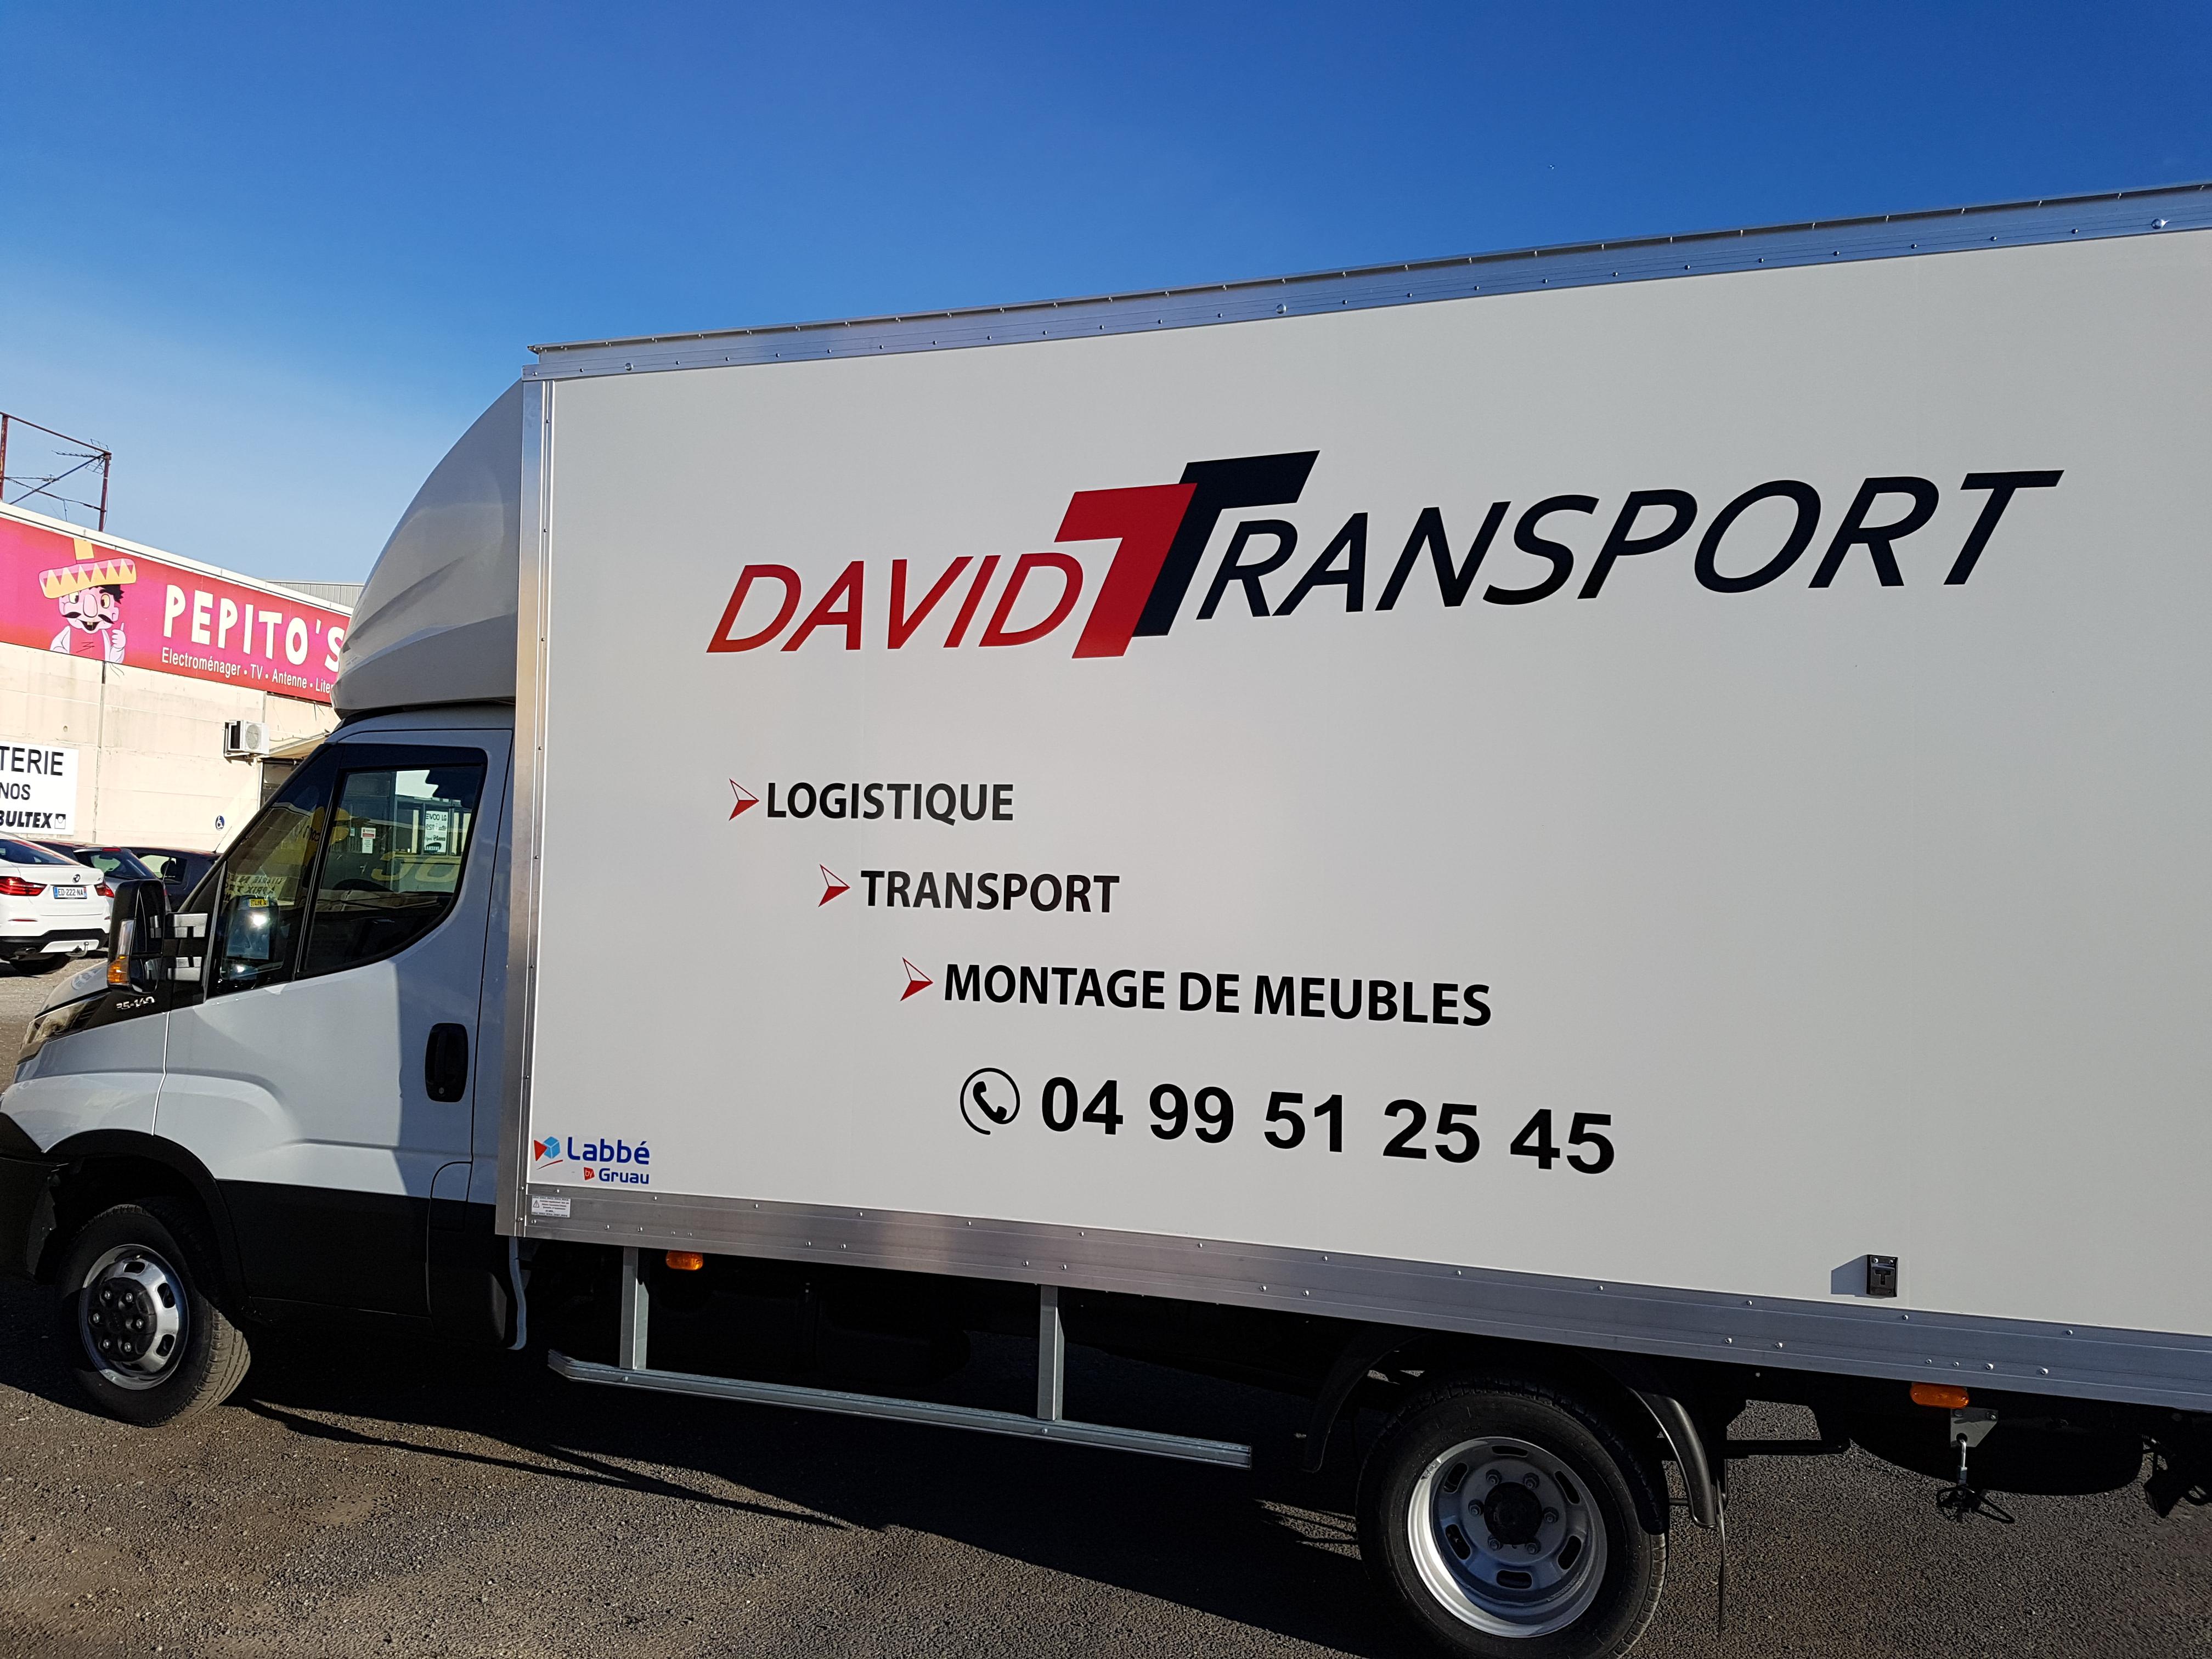 DAVID TRANSPORT